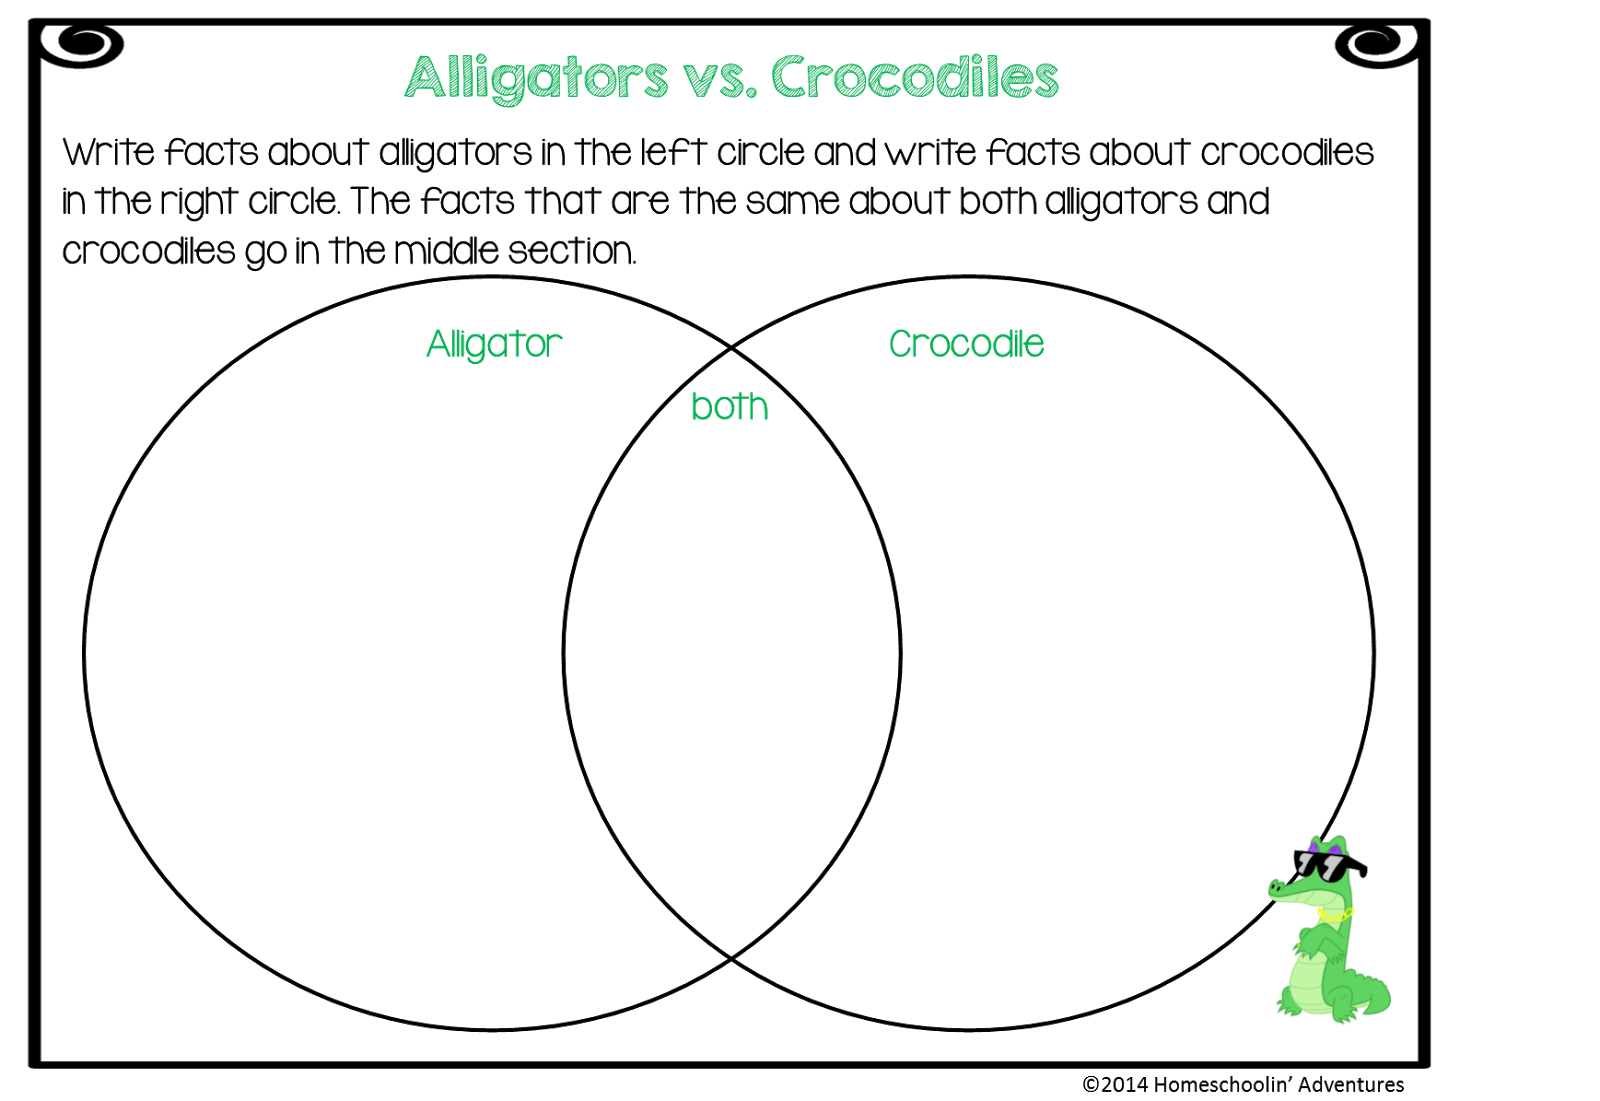 venn diagram of reptiles and amphibians rj45 jack wiring homeschoolin 39 adventures unit study freebie